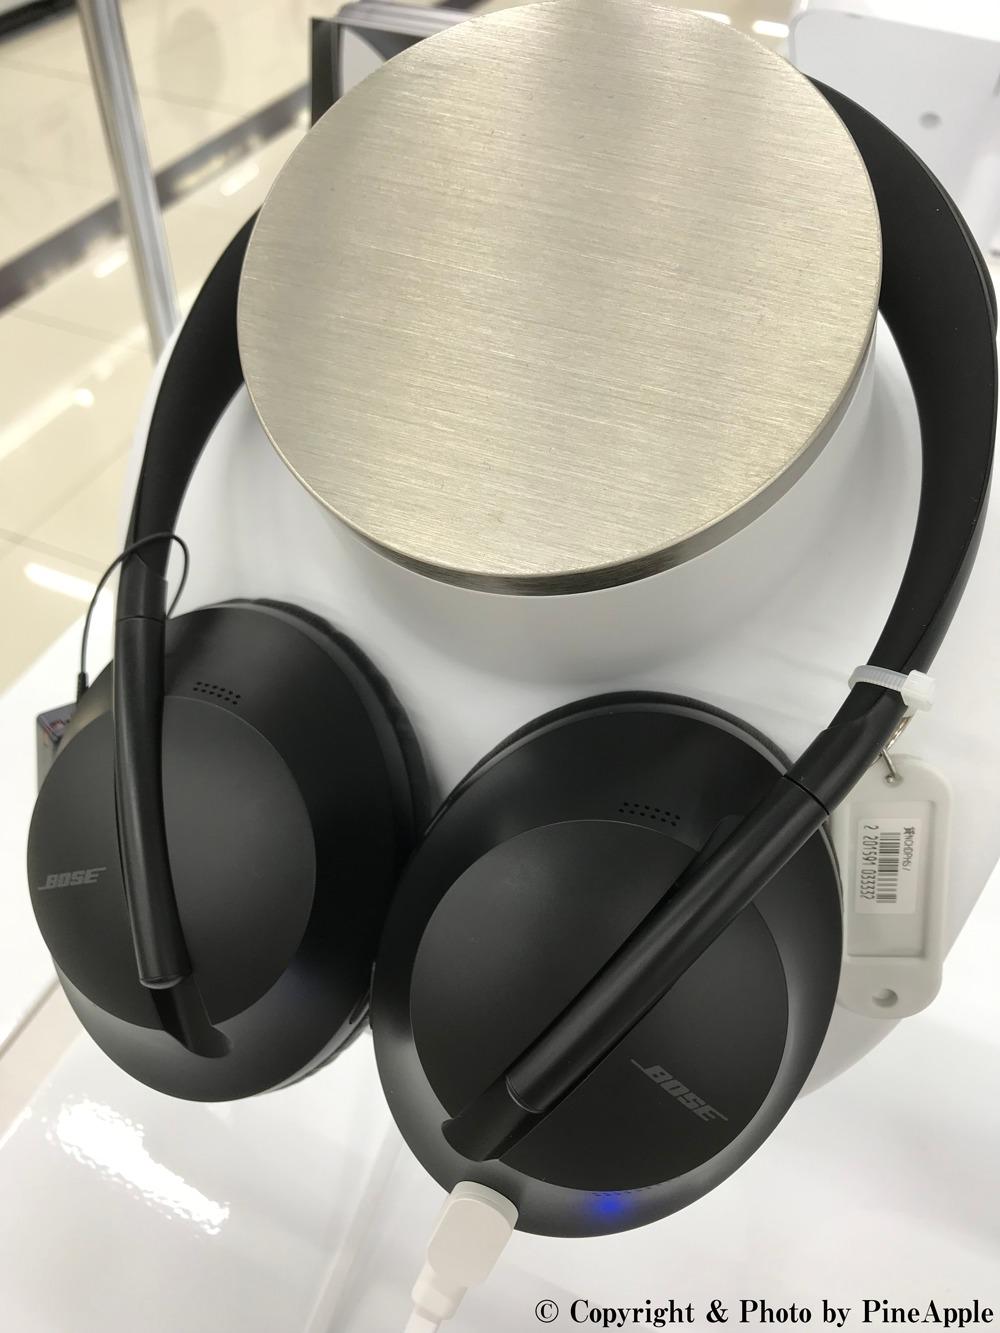 BOSE NOICE CANCELING HEADPHONES 700